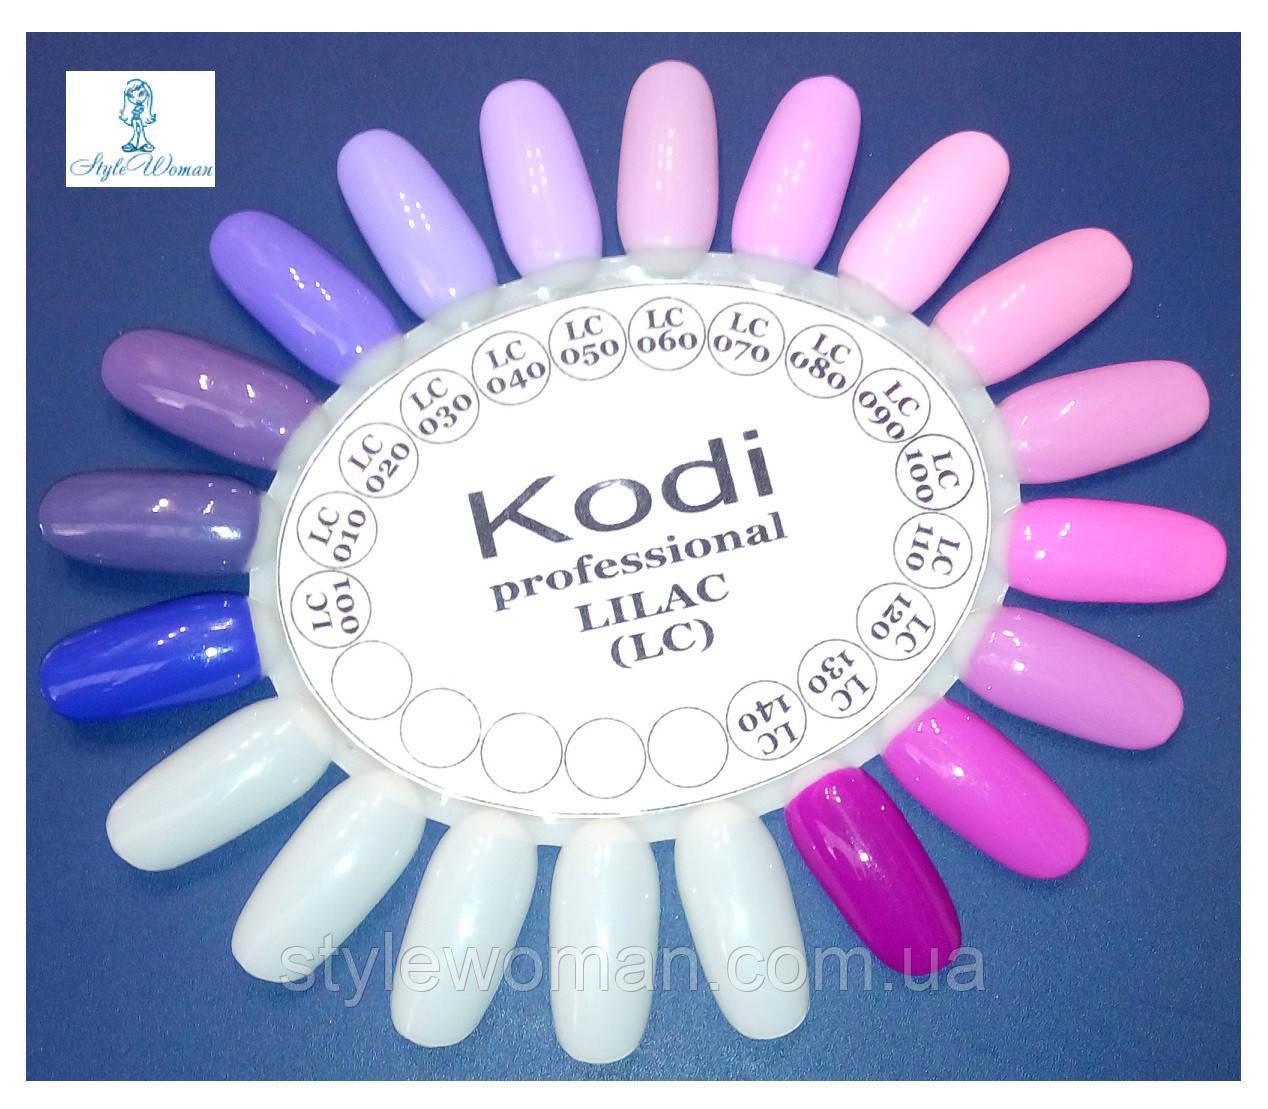 Гель лак Kodi professional LC 8мл Коди серия LILAC